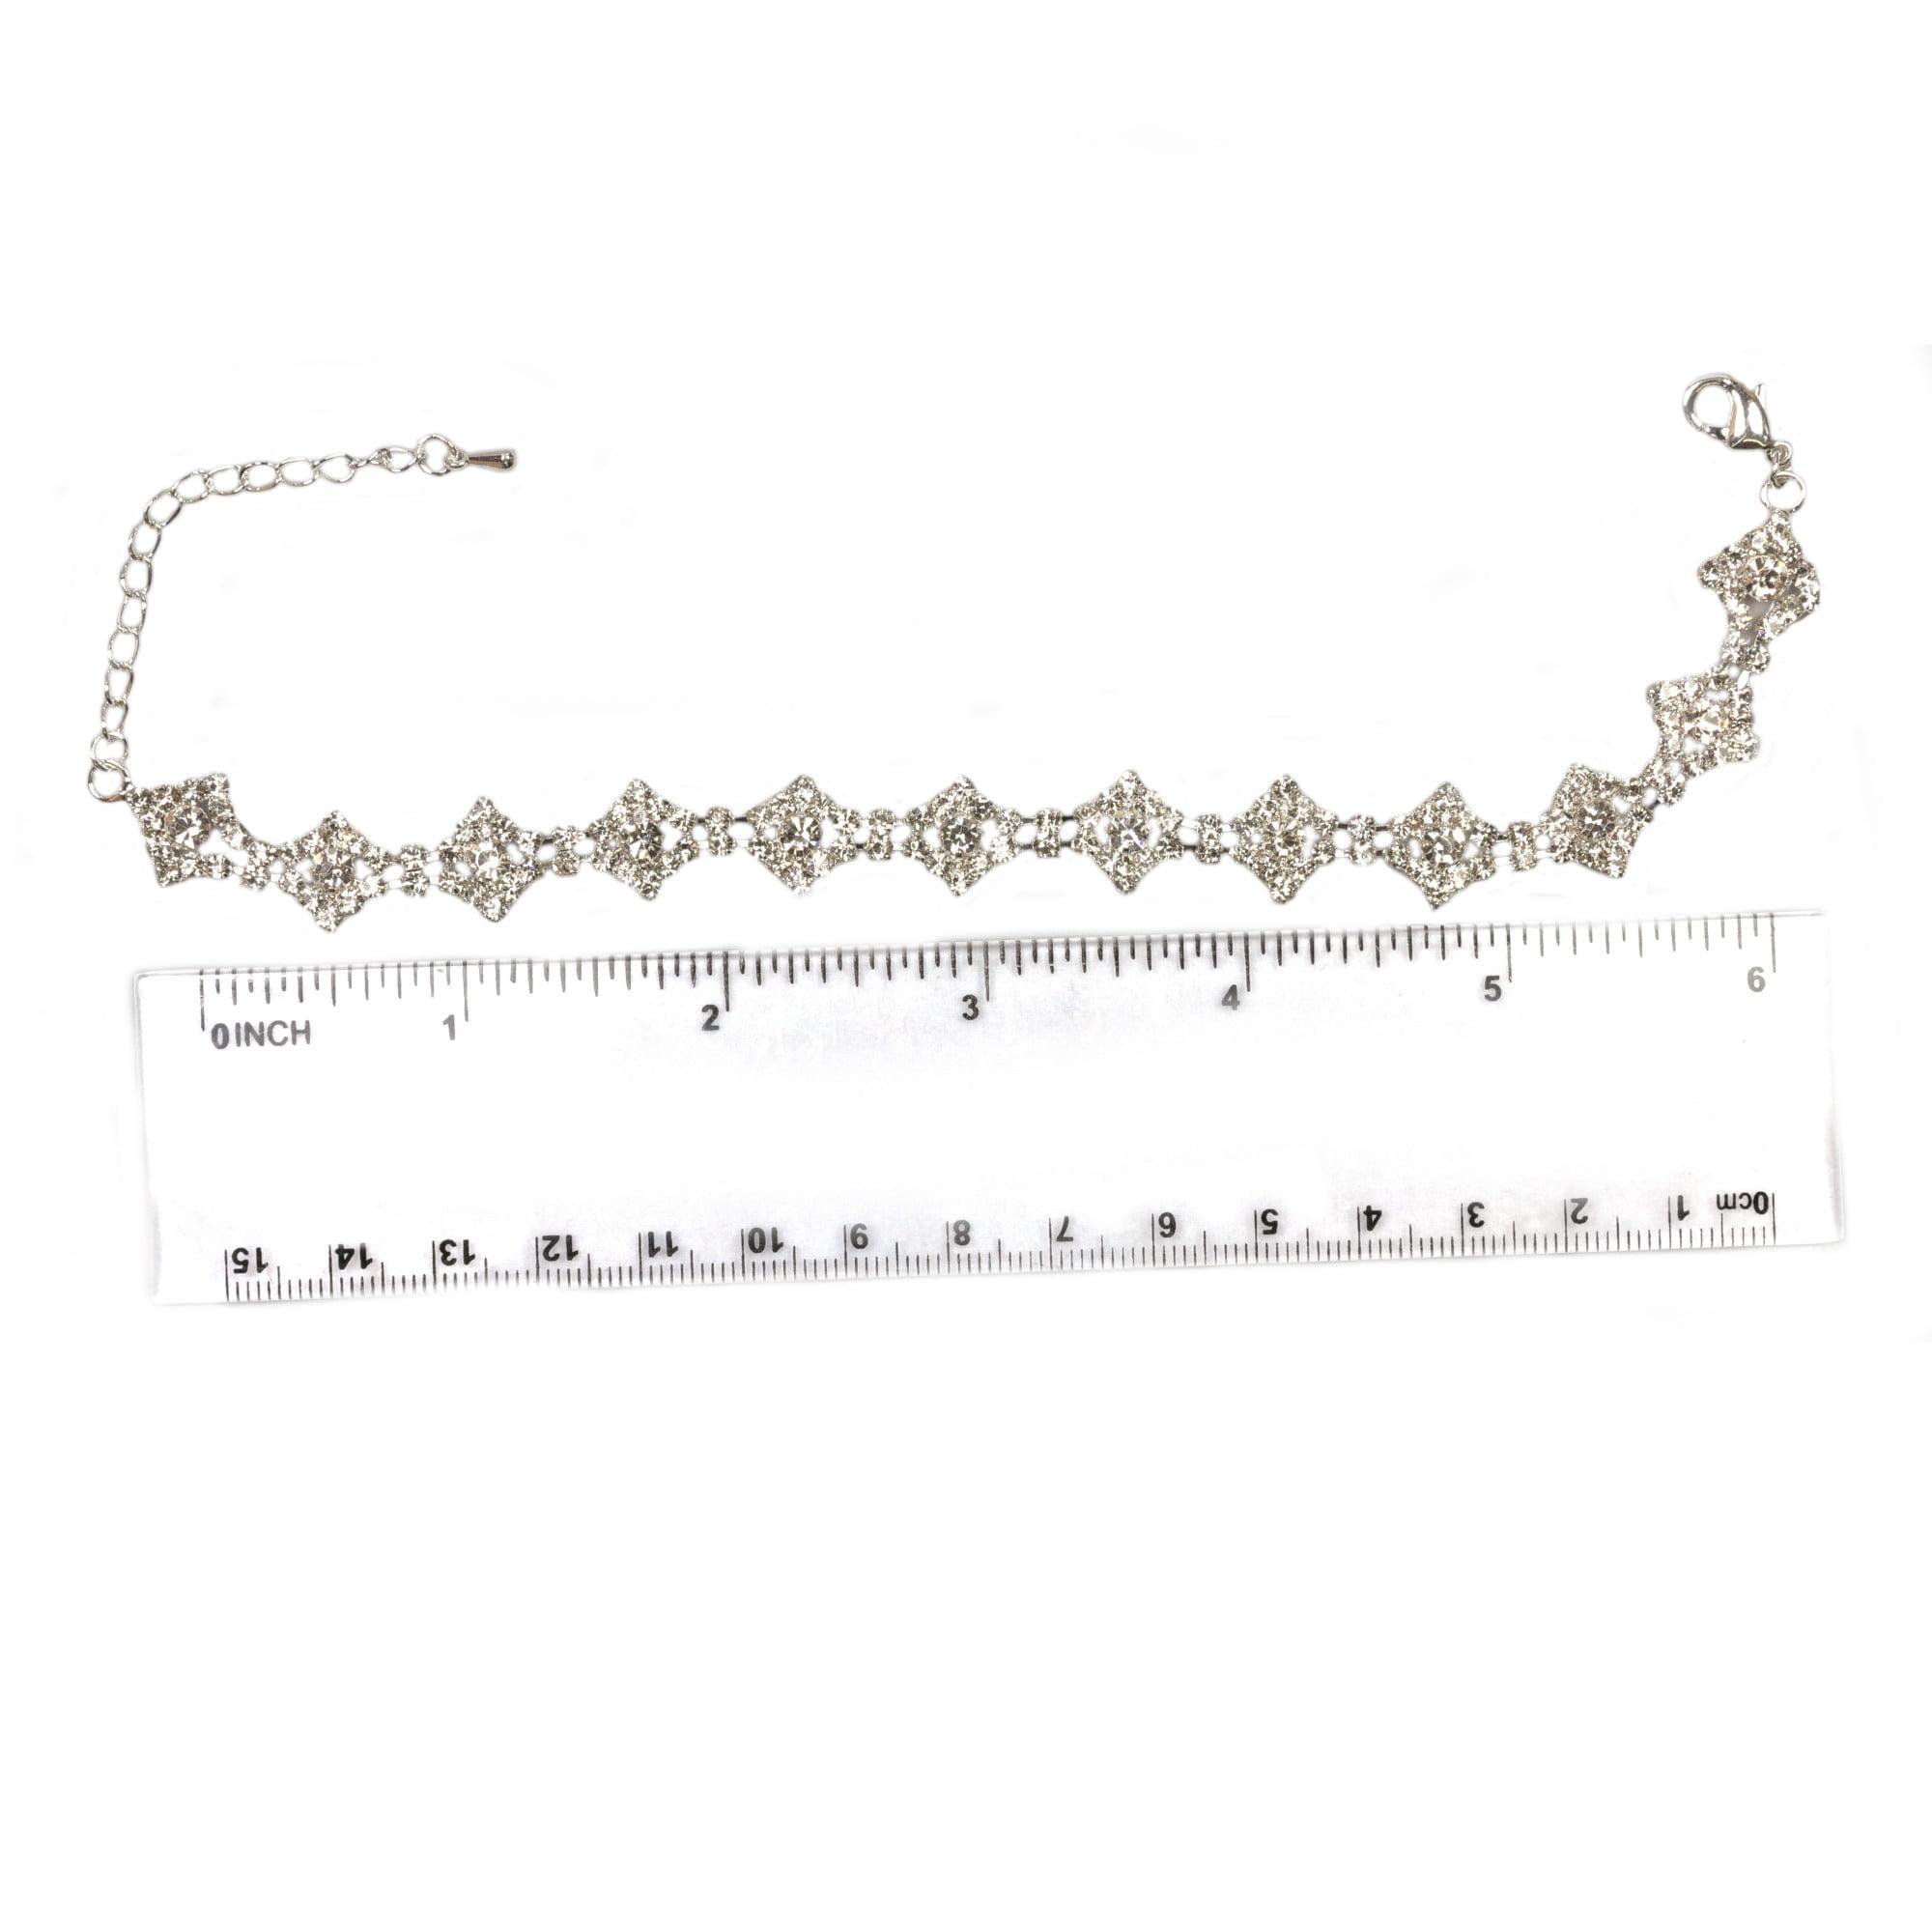 Clear crystal bling bracelet in silver plate ruler